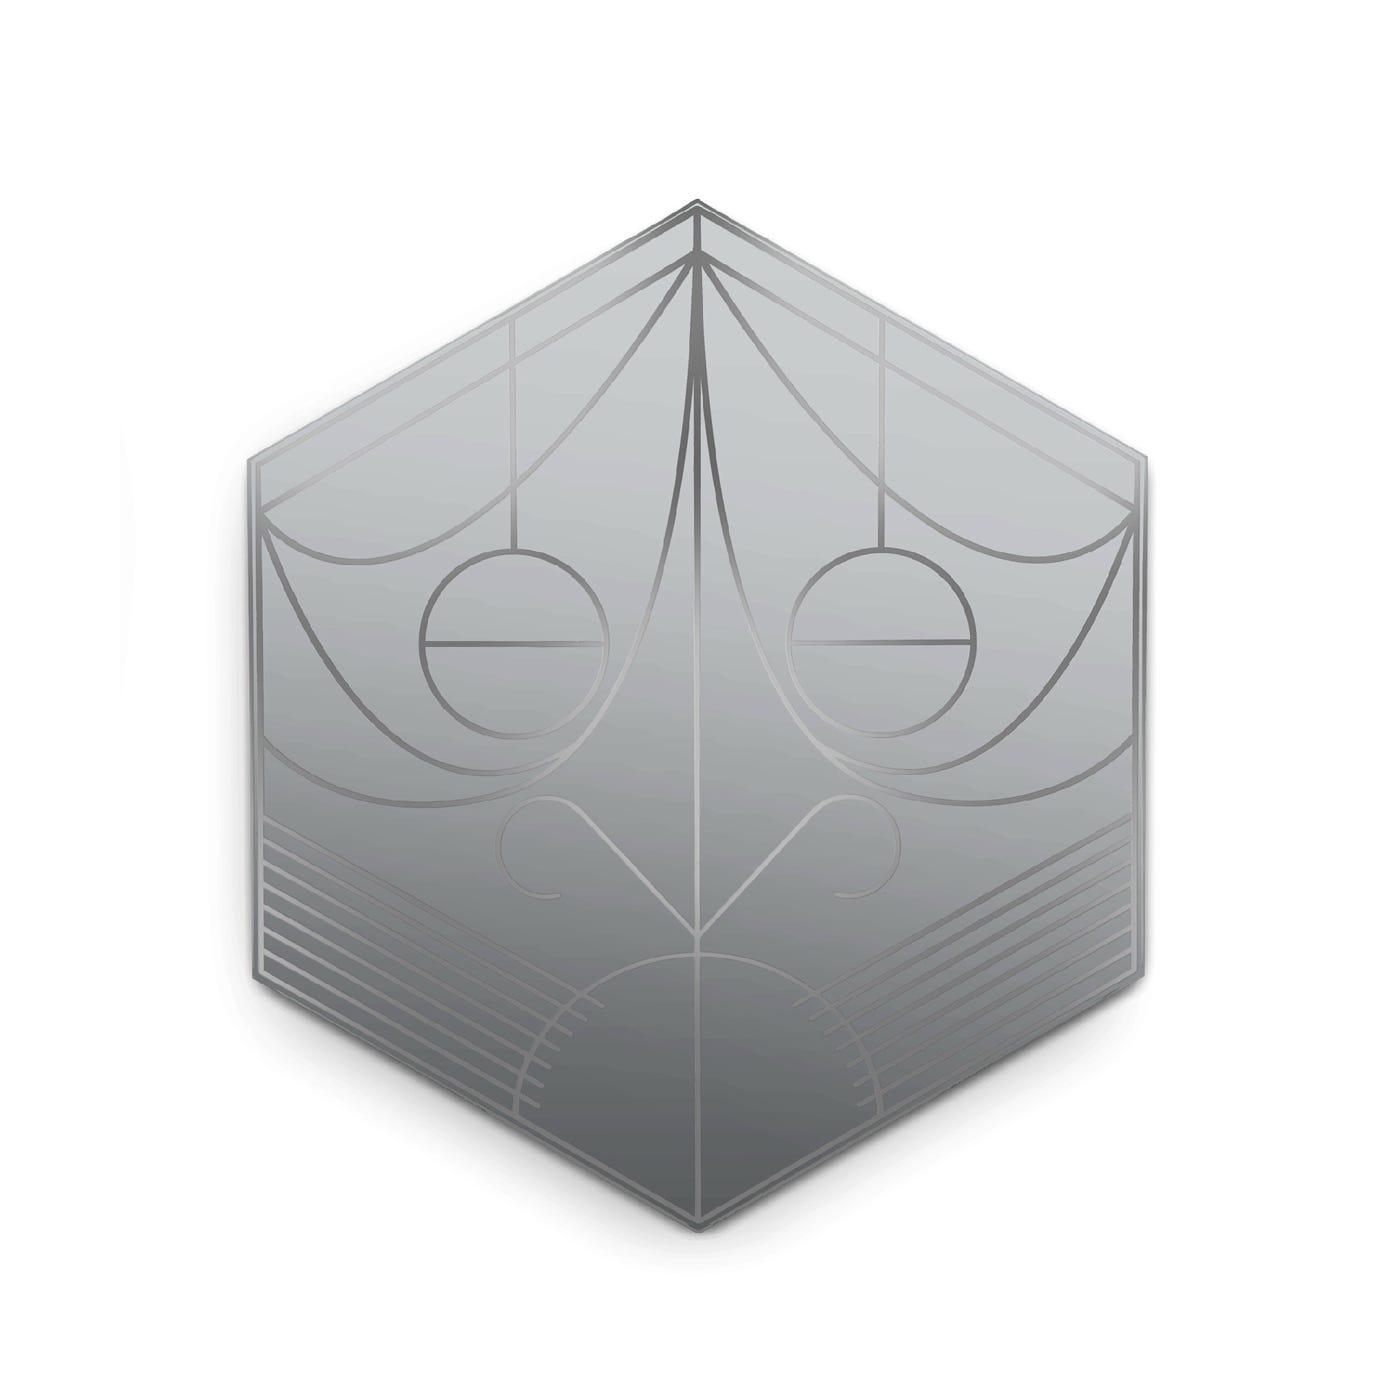 Petite Friture Mask Hexagon Lead Wall Mirror